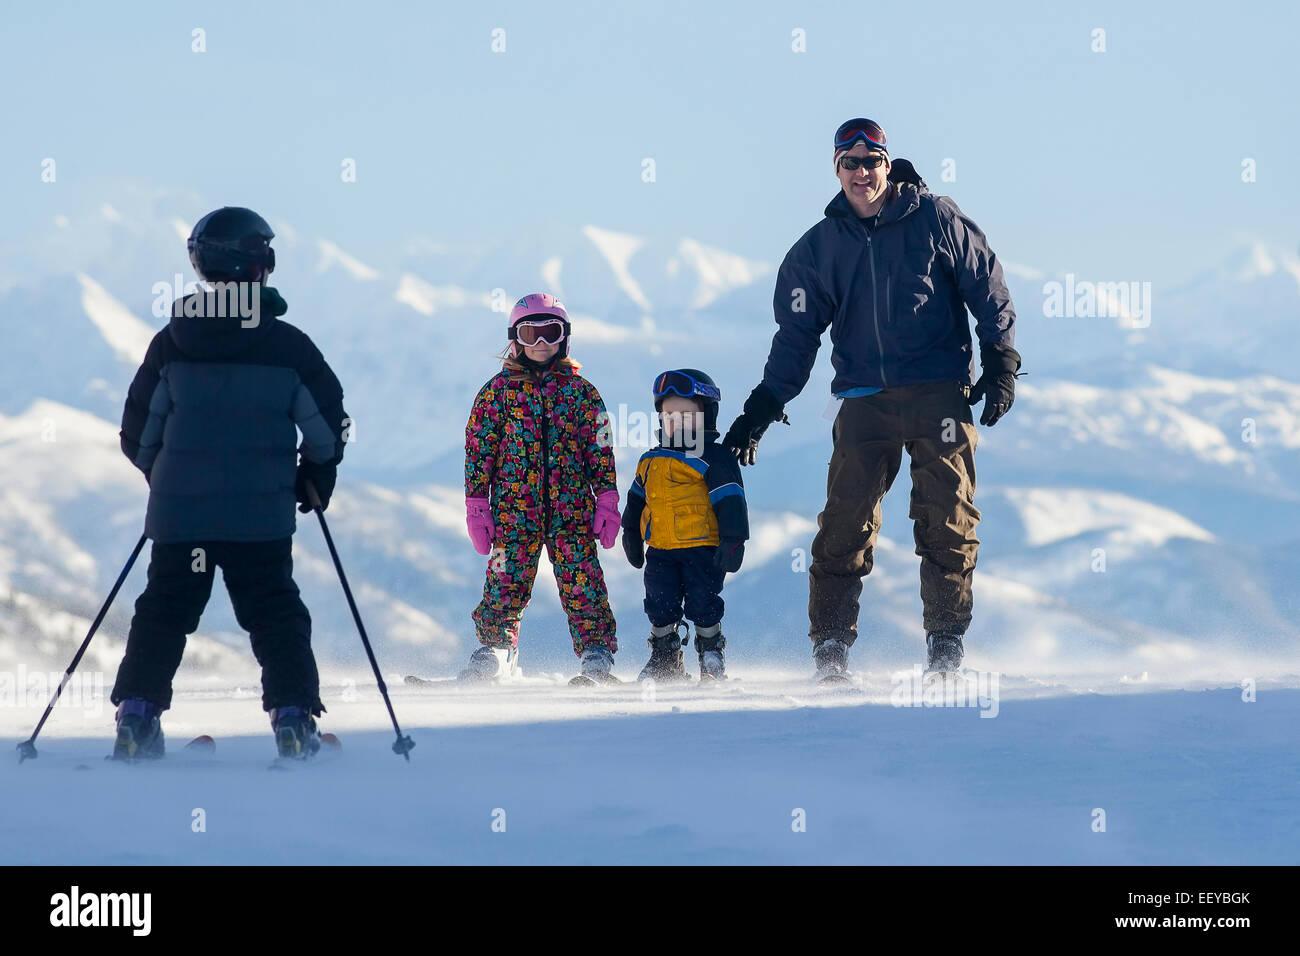 USA, Montana, Whitefish, Father skiing with children (6-7, 8-9) - Stock Image